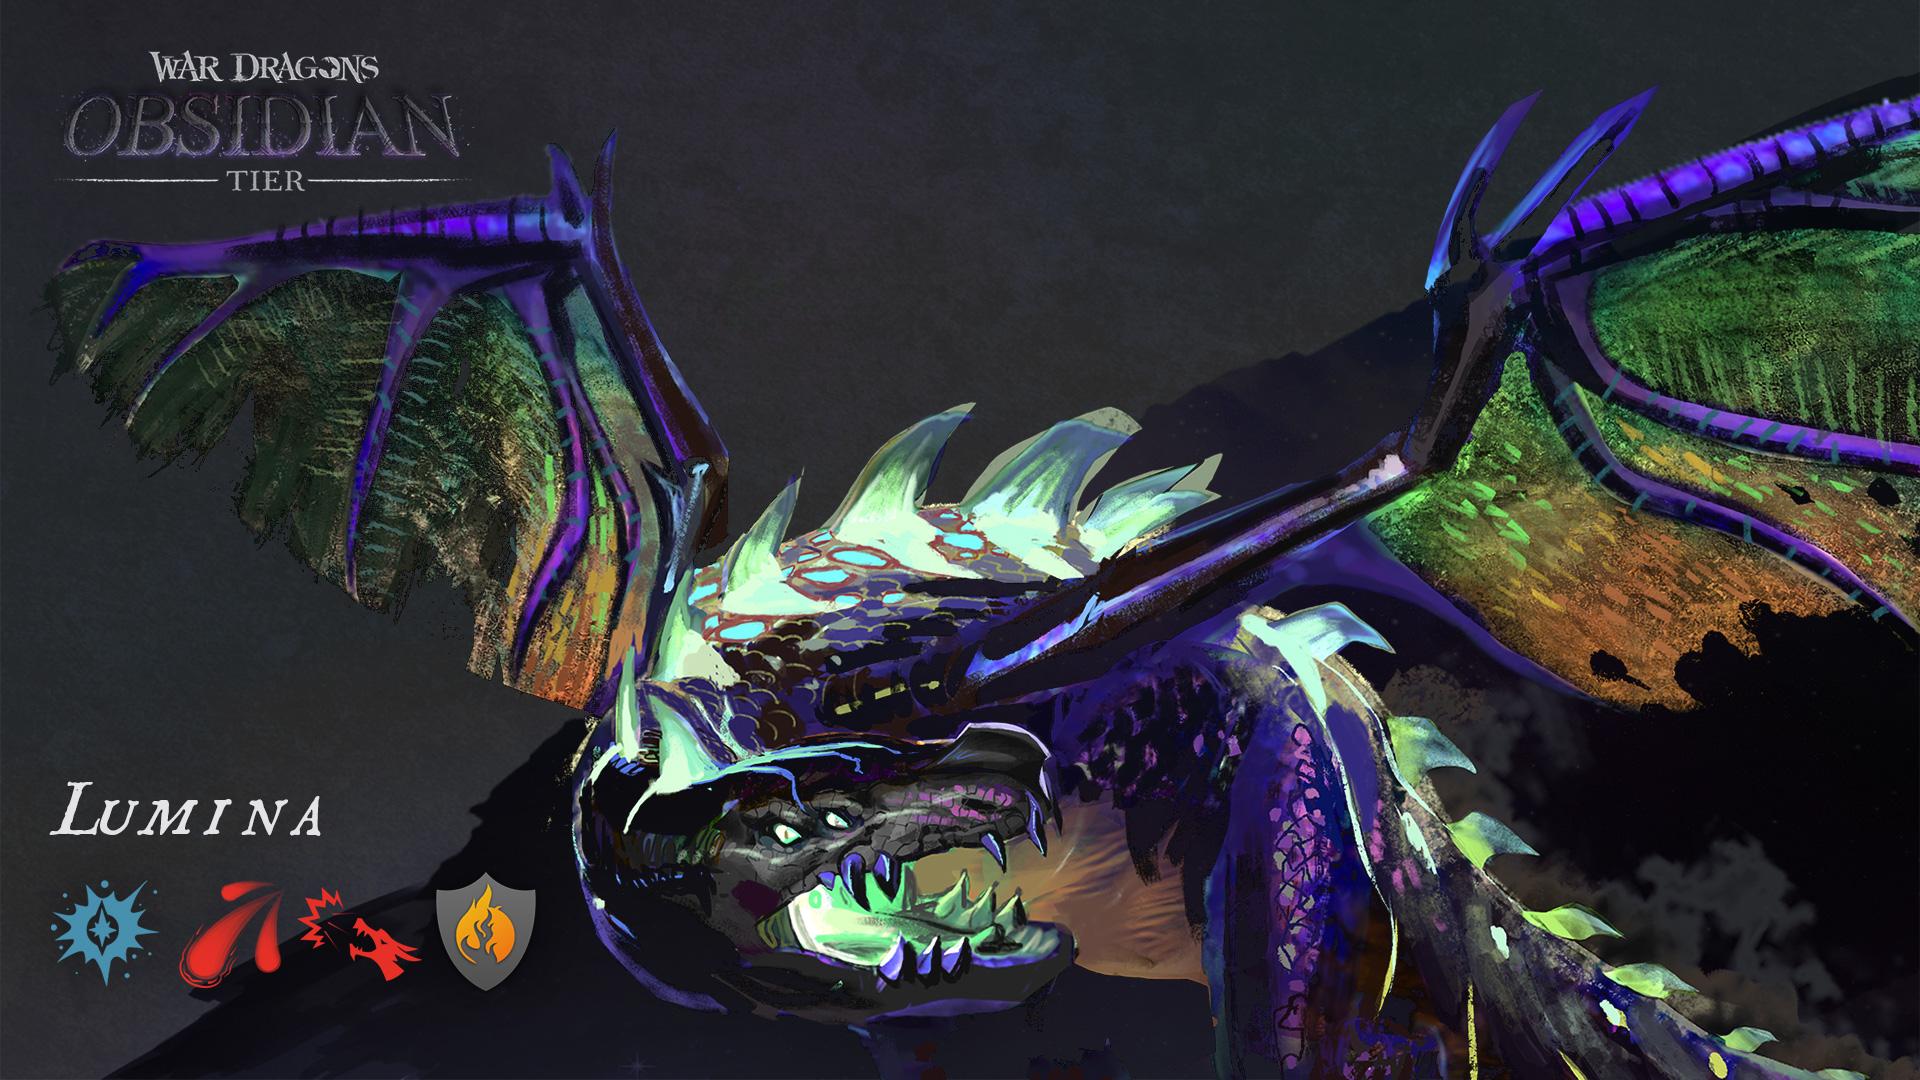 War Dragons - Lumina